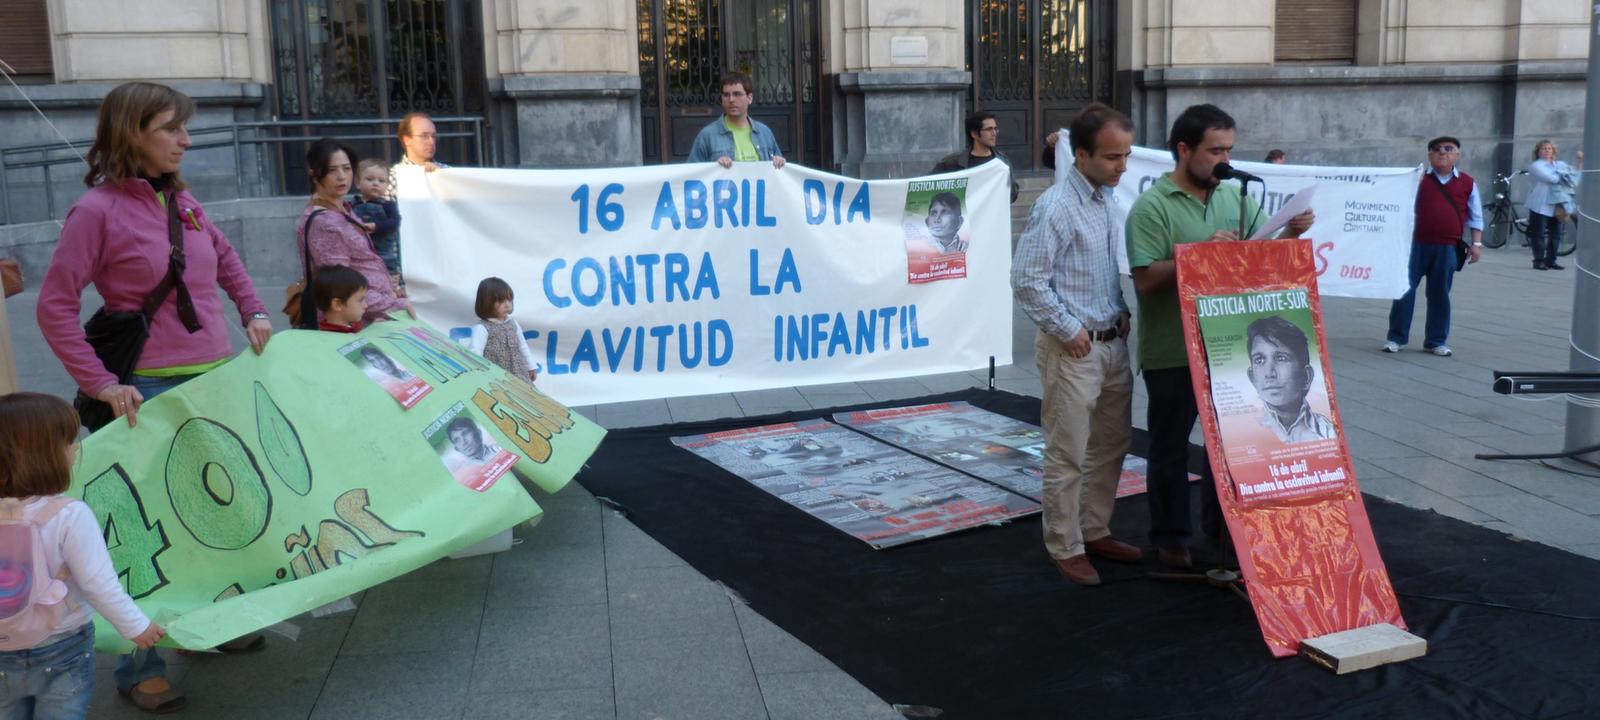 discreto córneo esclavitud en Zaragoza